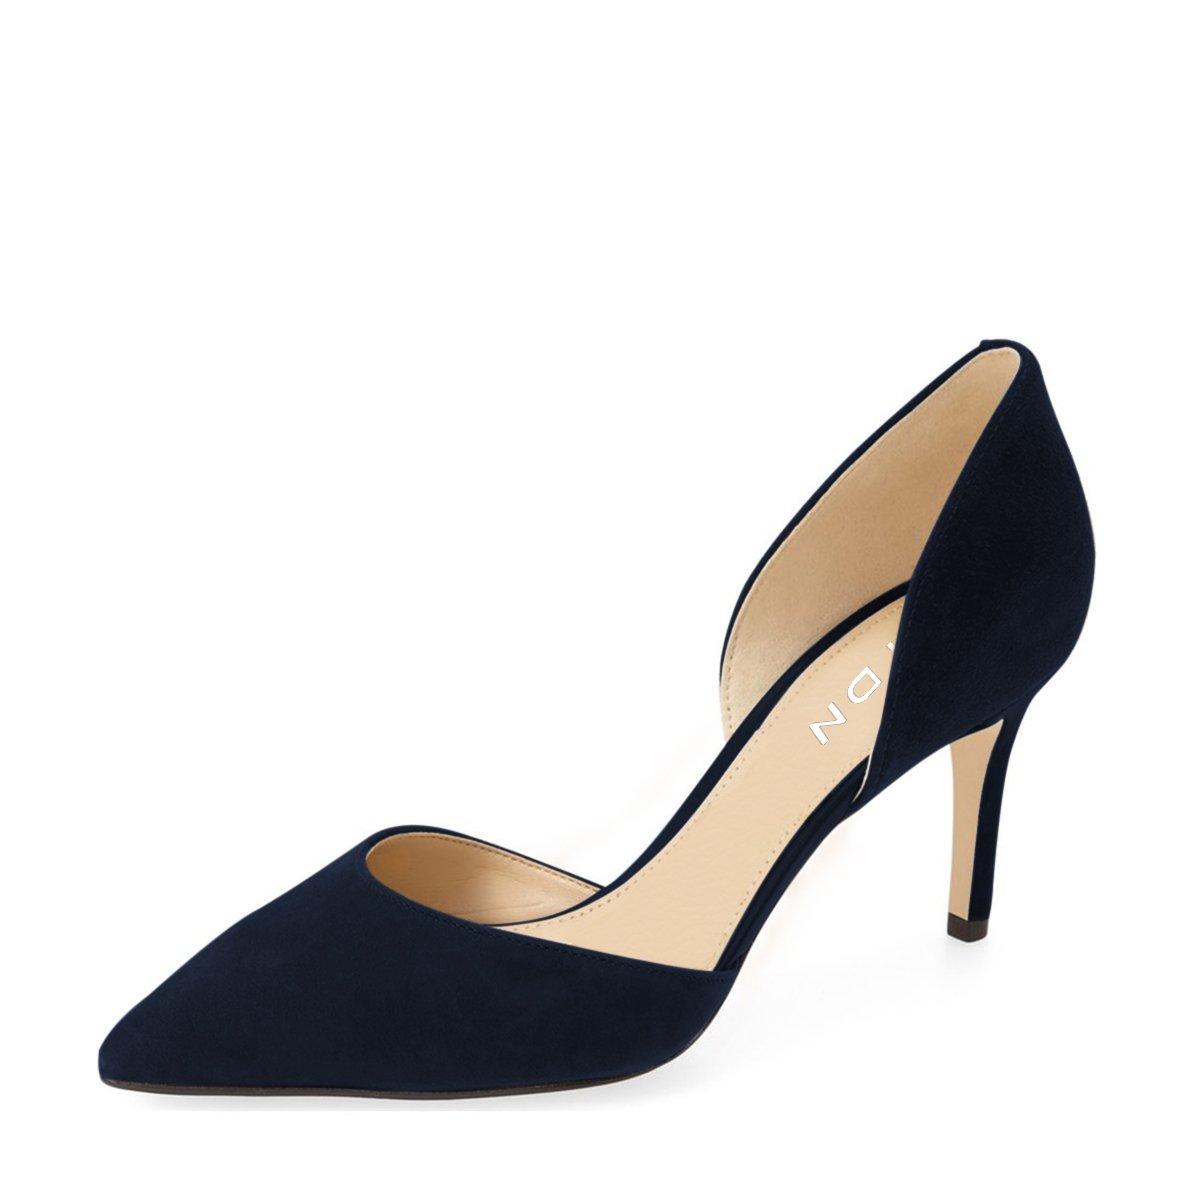 YDN Women Classic Low Heels D'Orsay Pumps Suede Pointed Toe Slip On Dressy Stilettos Shoes B01N1RUU28 6 B(M) US|Dark Blue